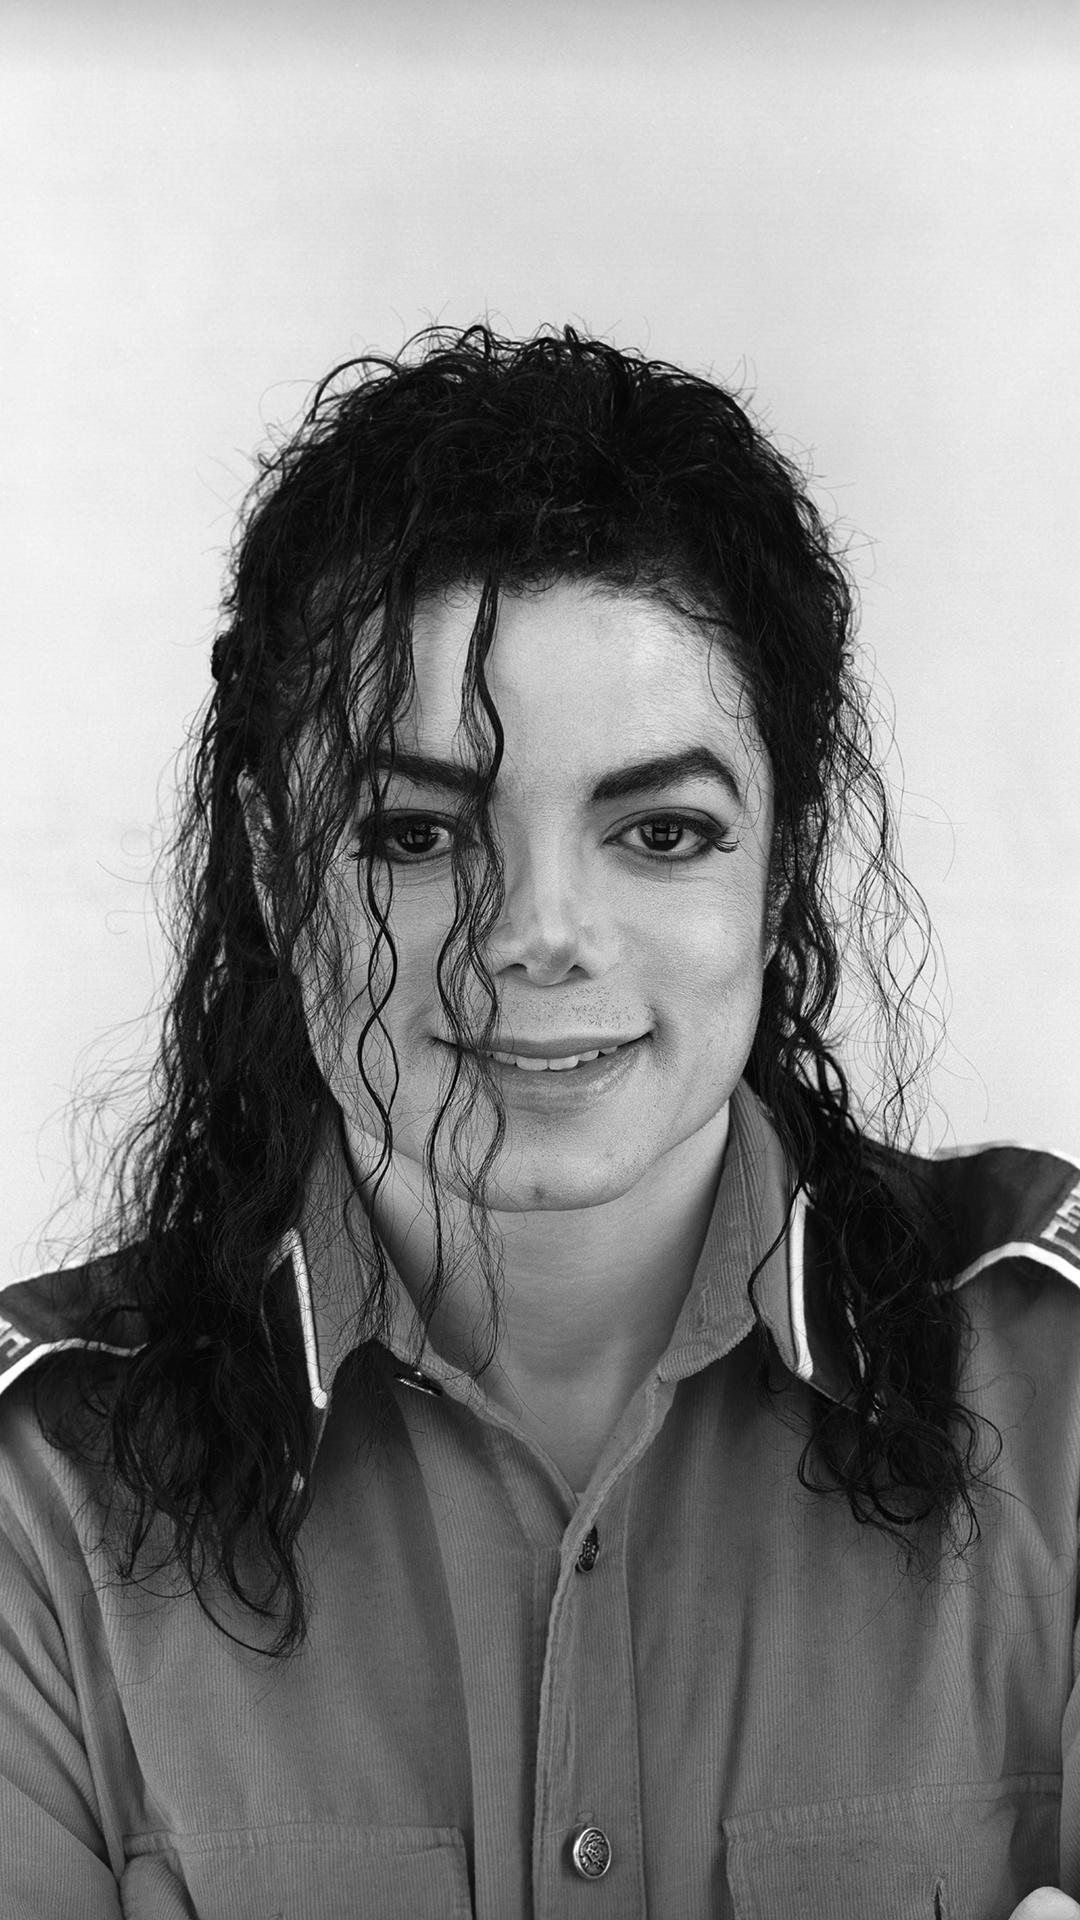 Michael Jackson htc one wallpaper